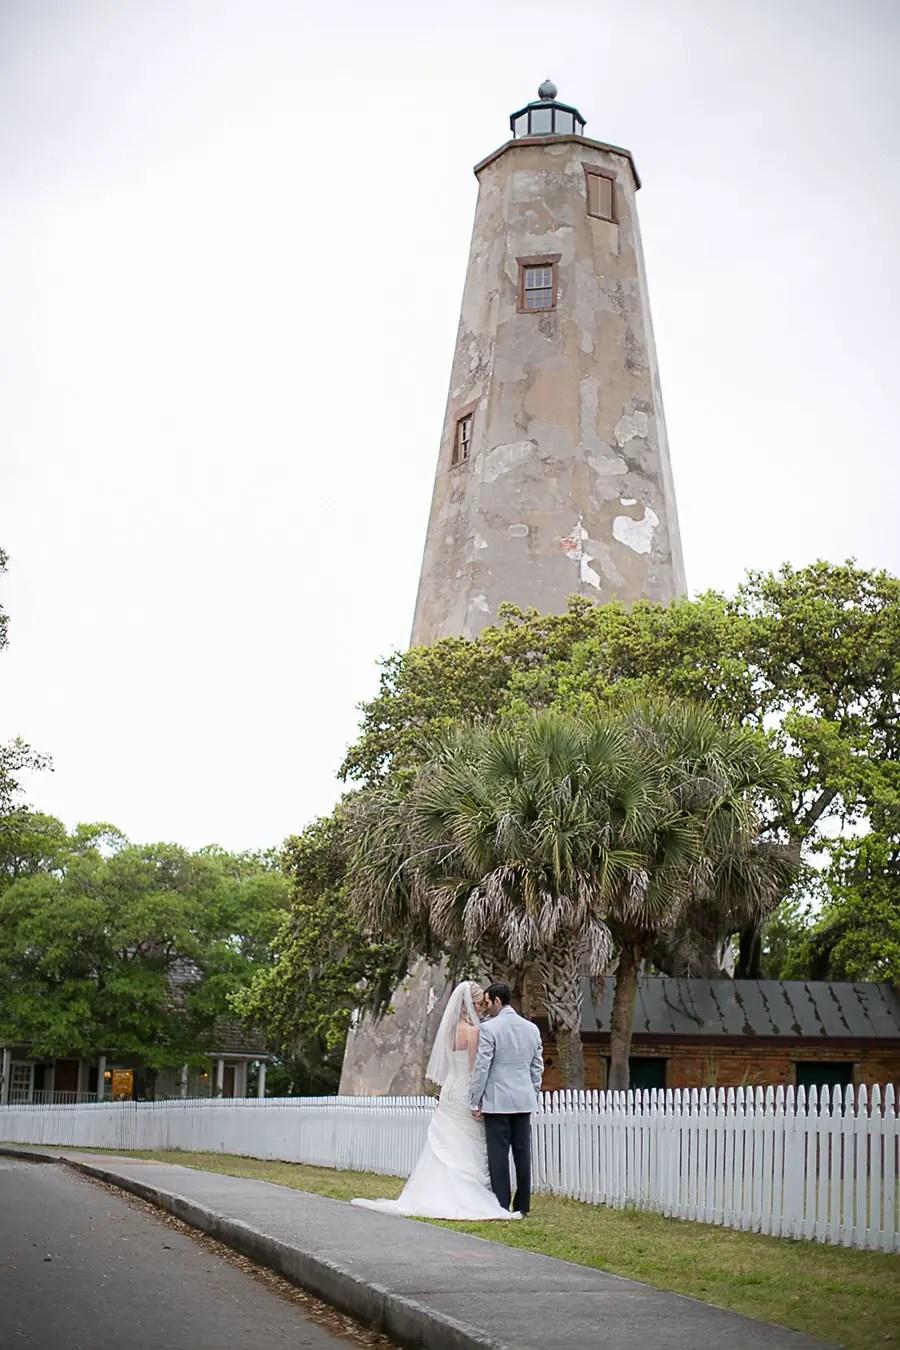 The Bride and Groom - Portraits - 1 - Bald Head Island Wedding - Photo by Eric Boneske